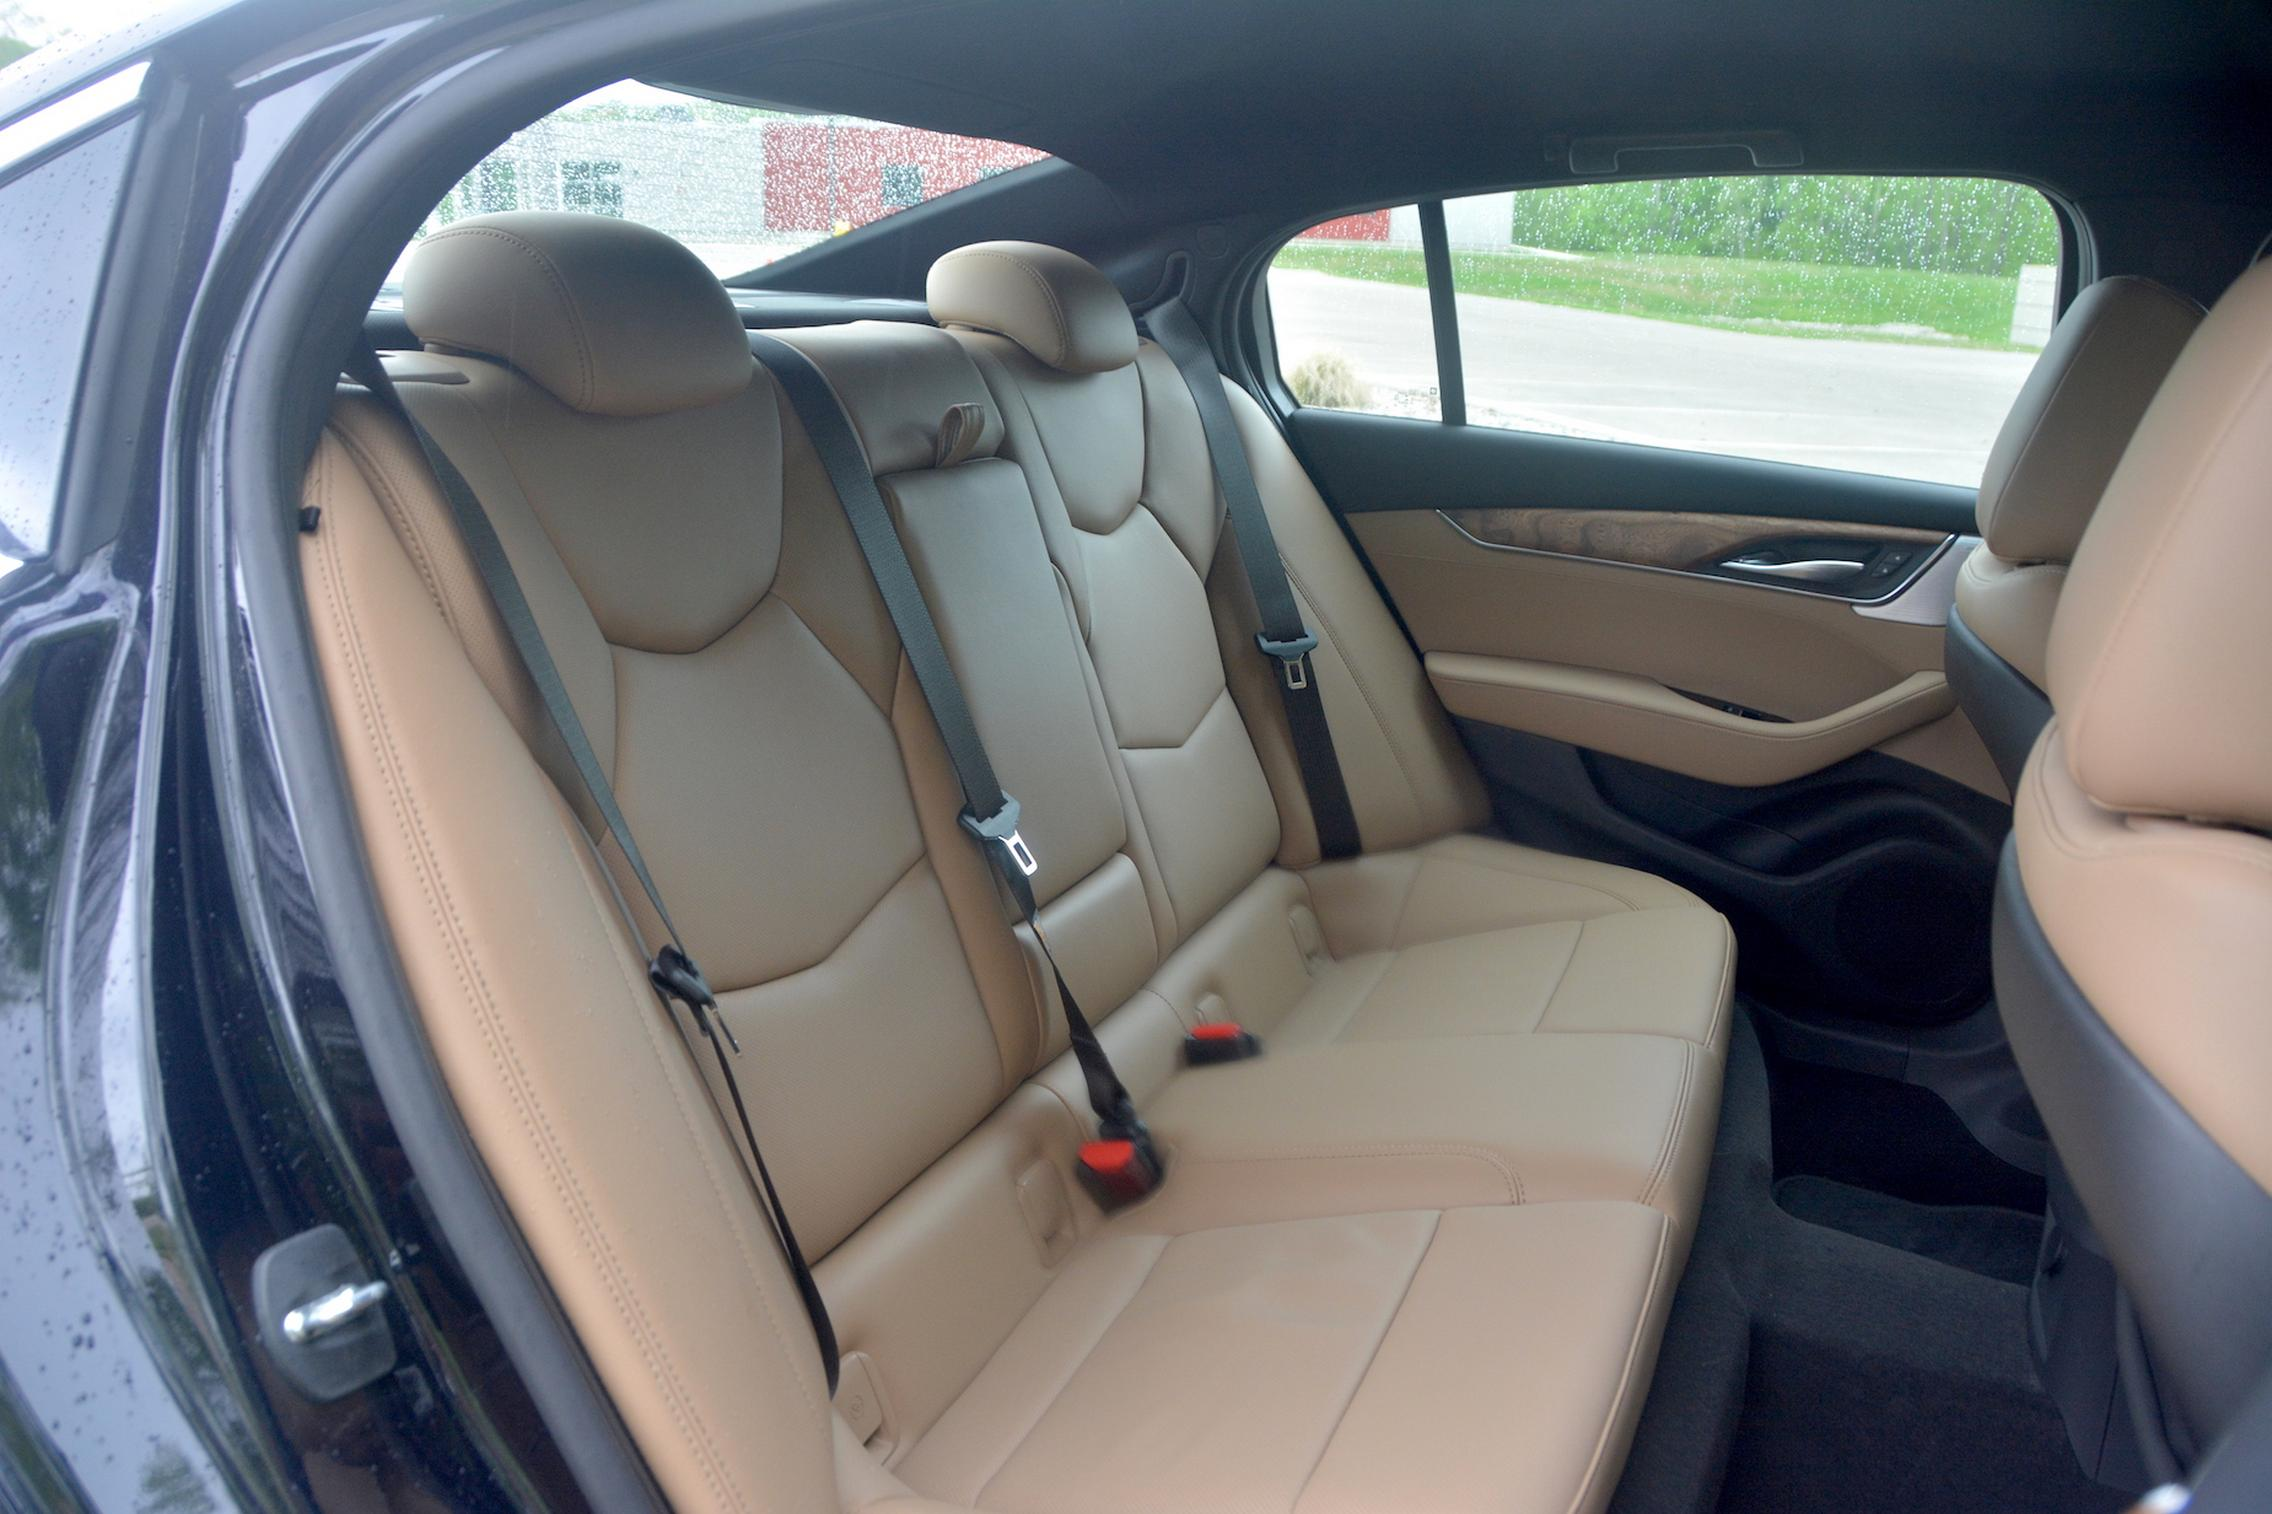 2021 Cadillac CT5 rear seats